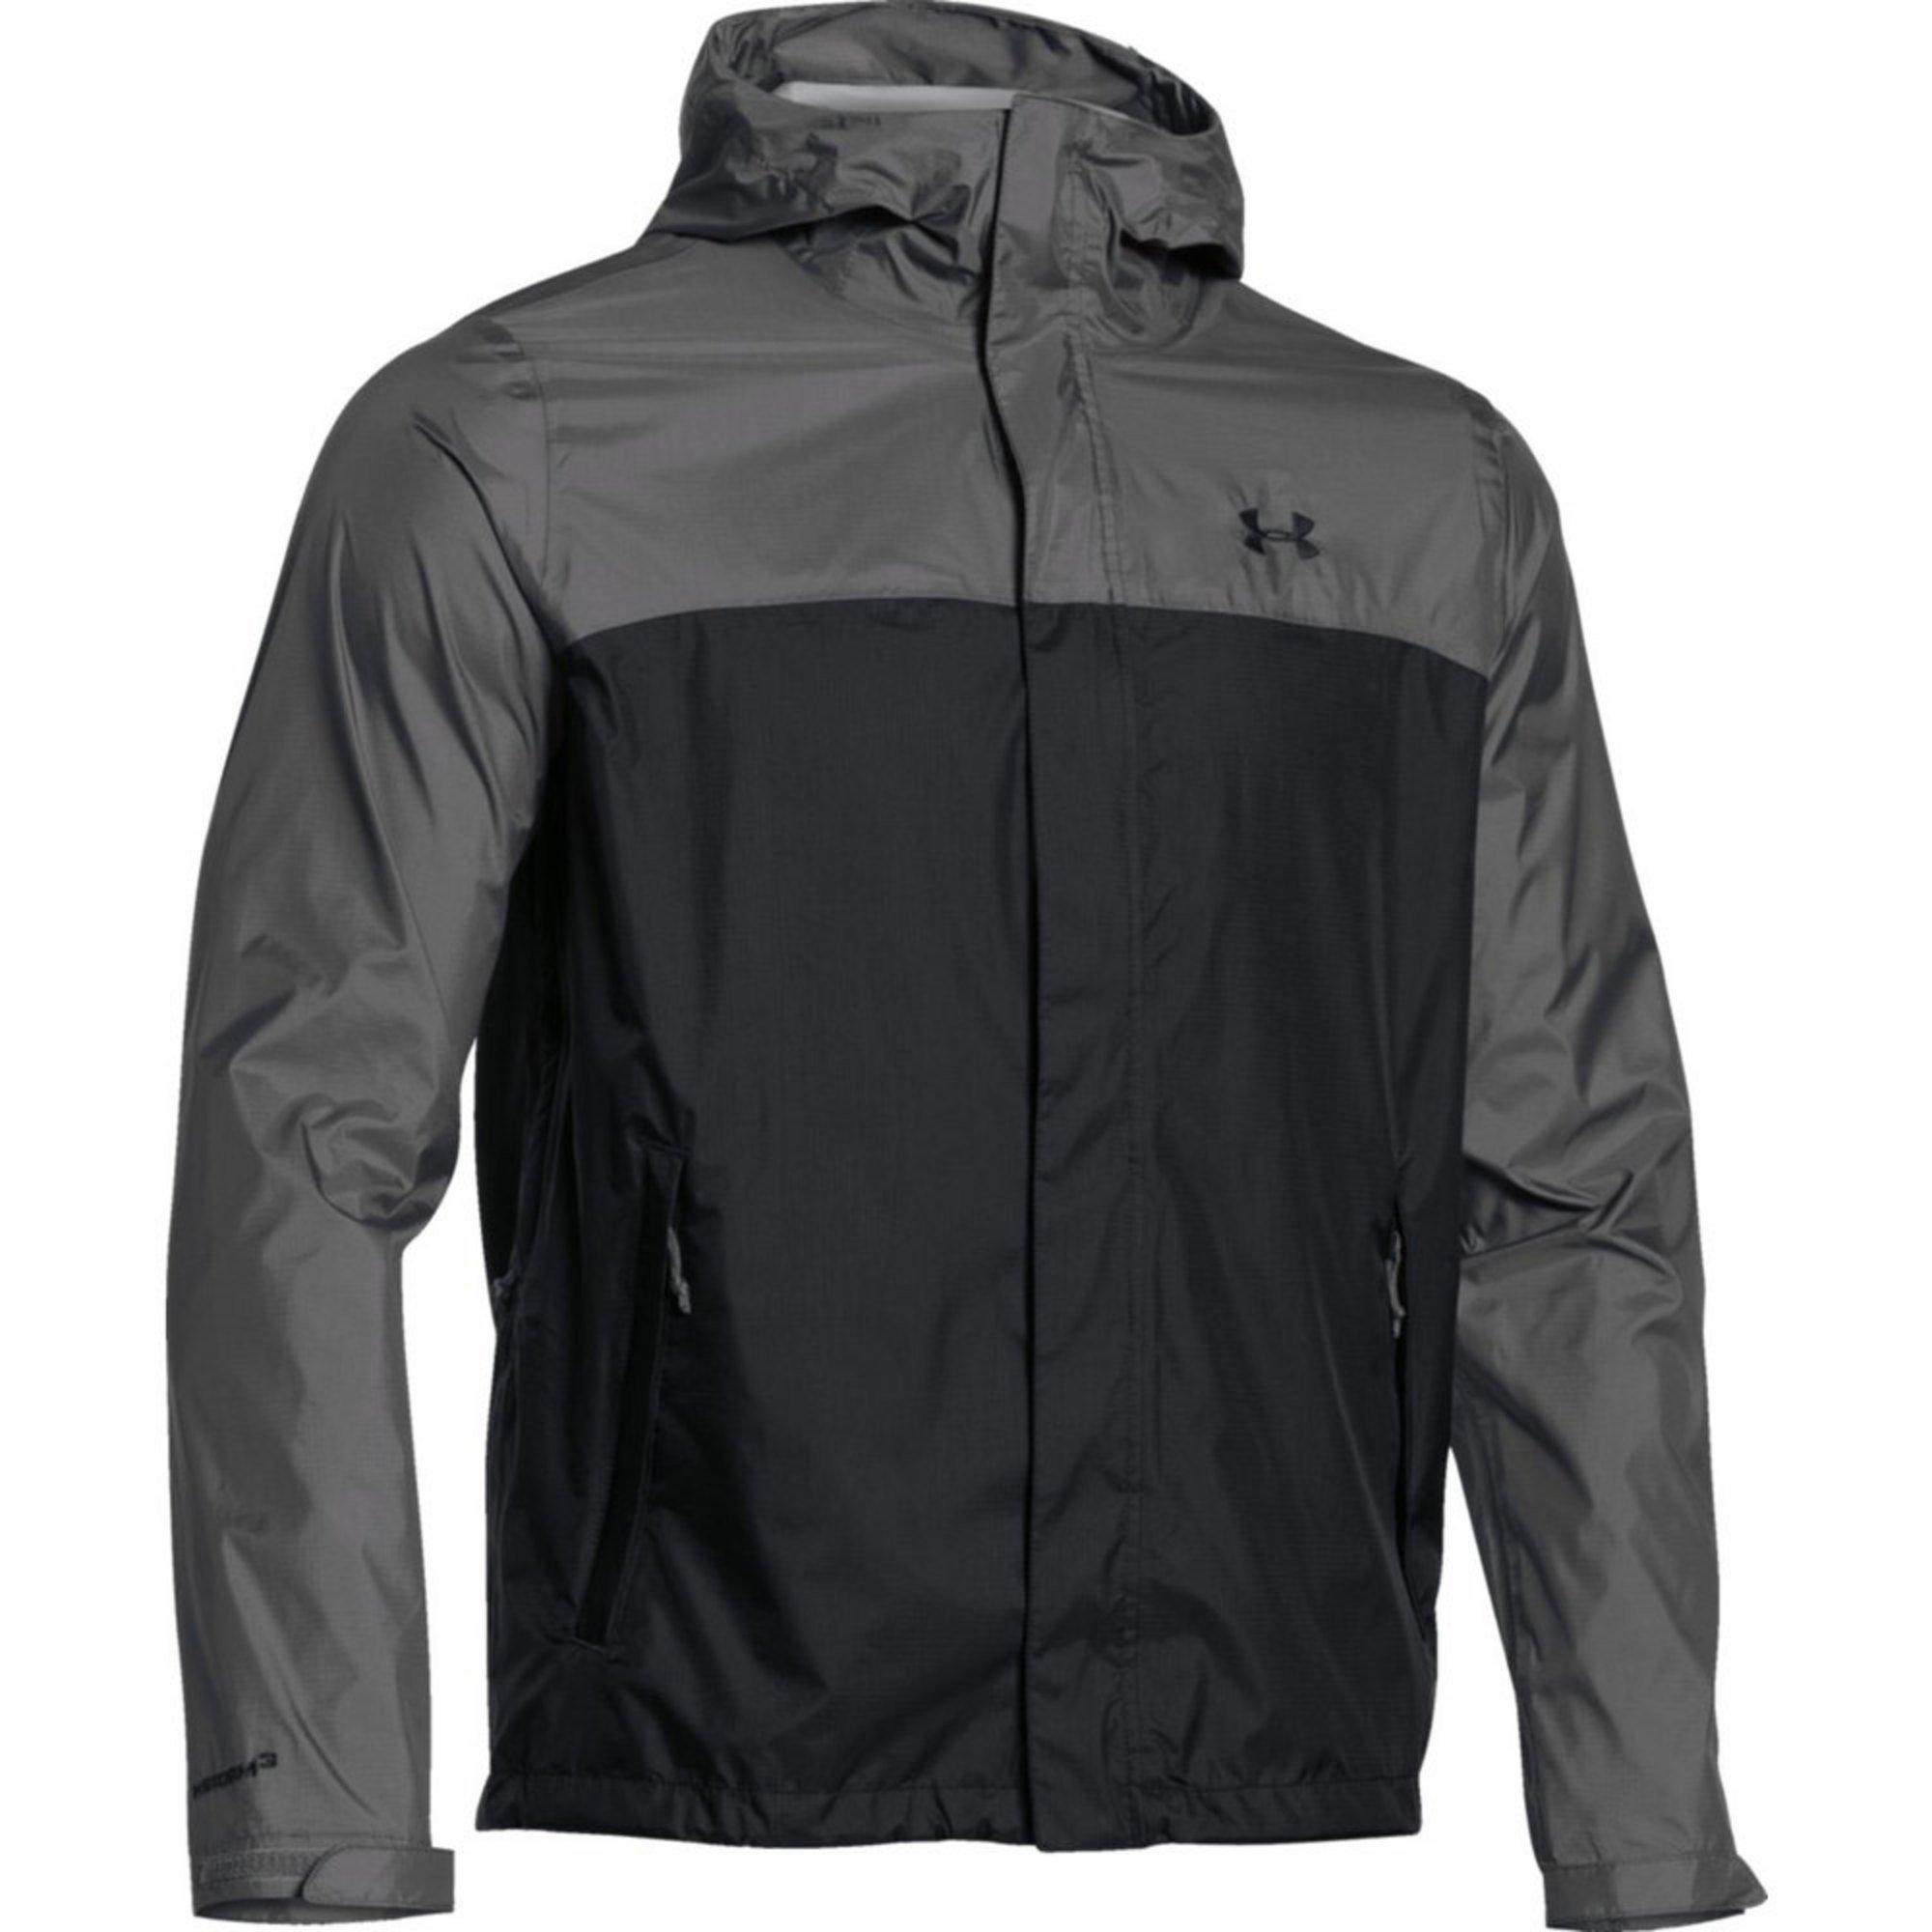 Under armour men 39 s surge jacket men 39 s clothing men for Under armour men s shirts clearance